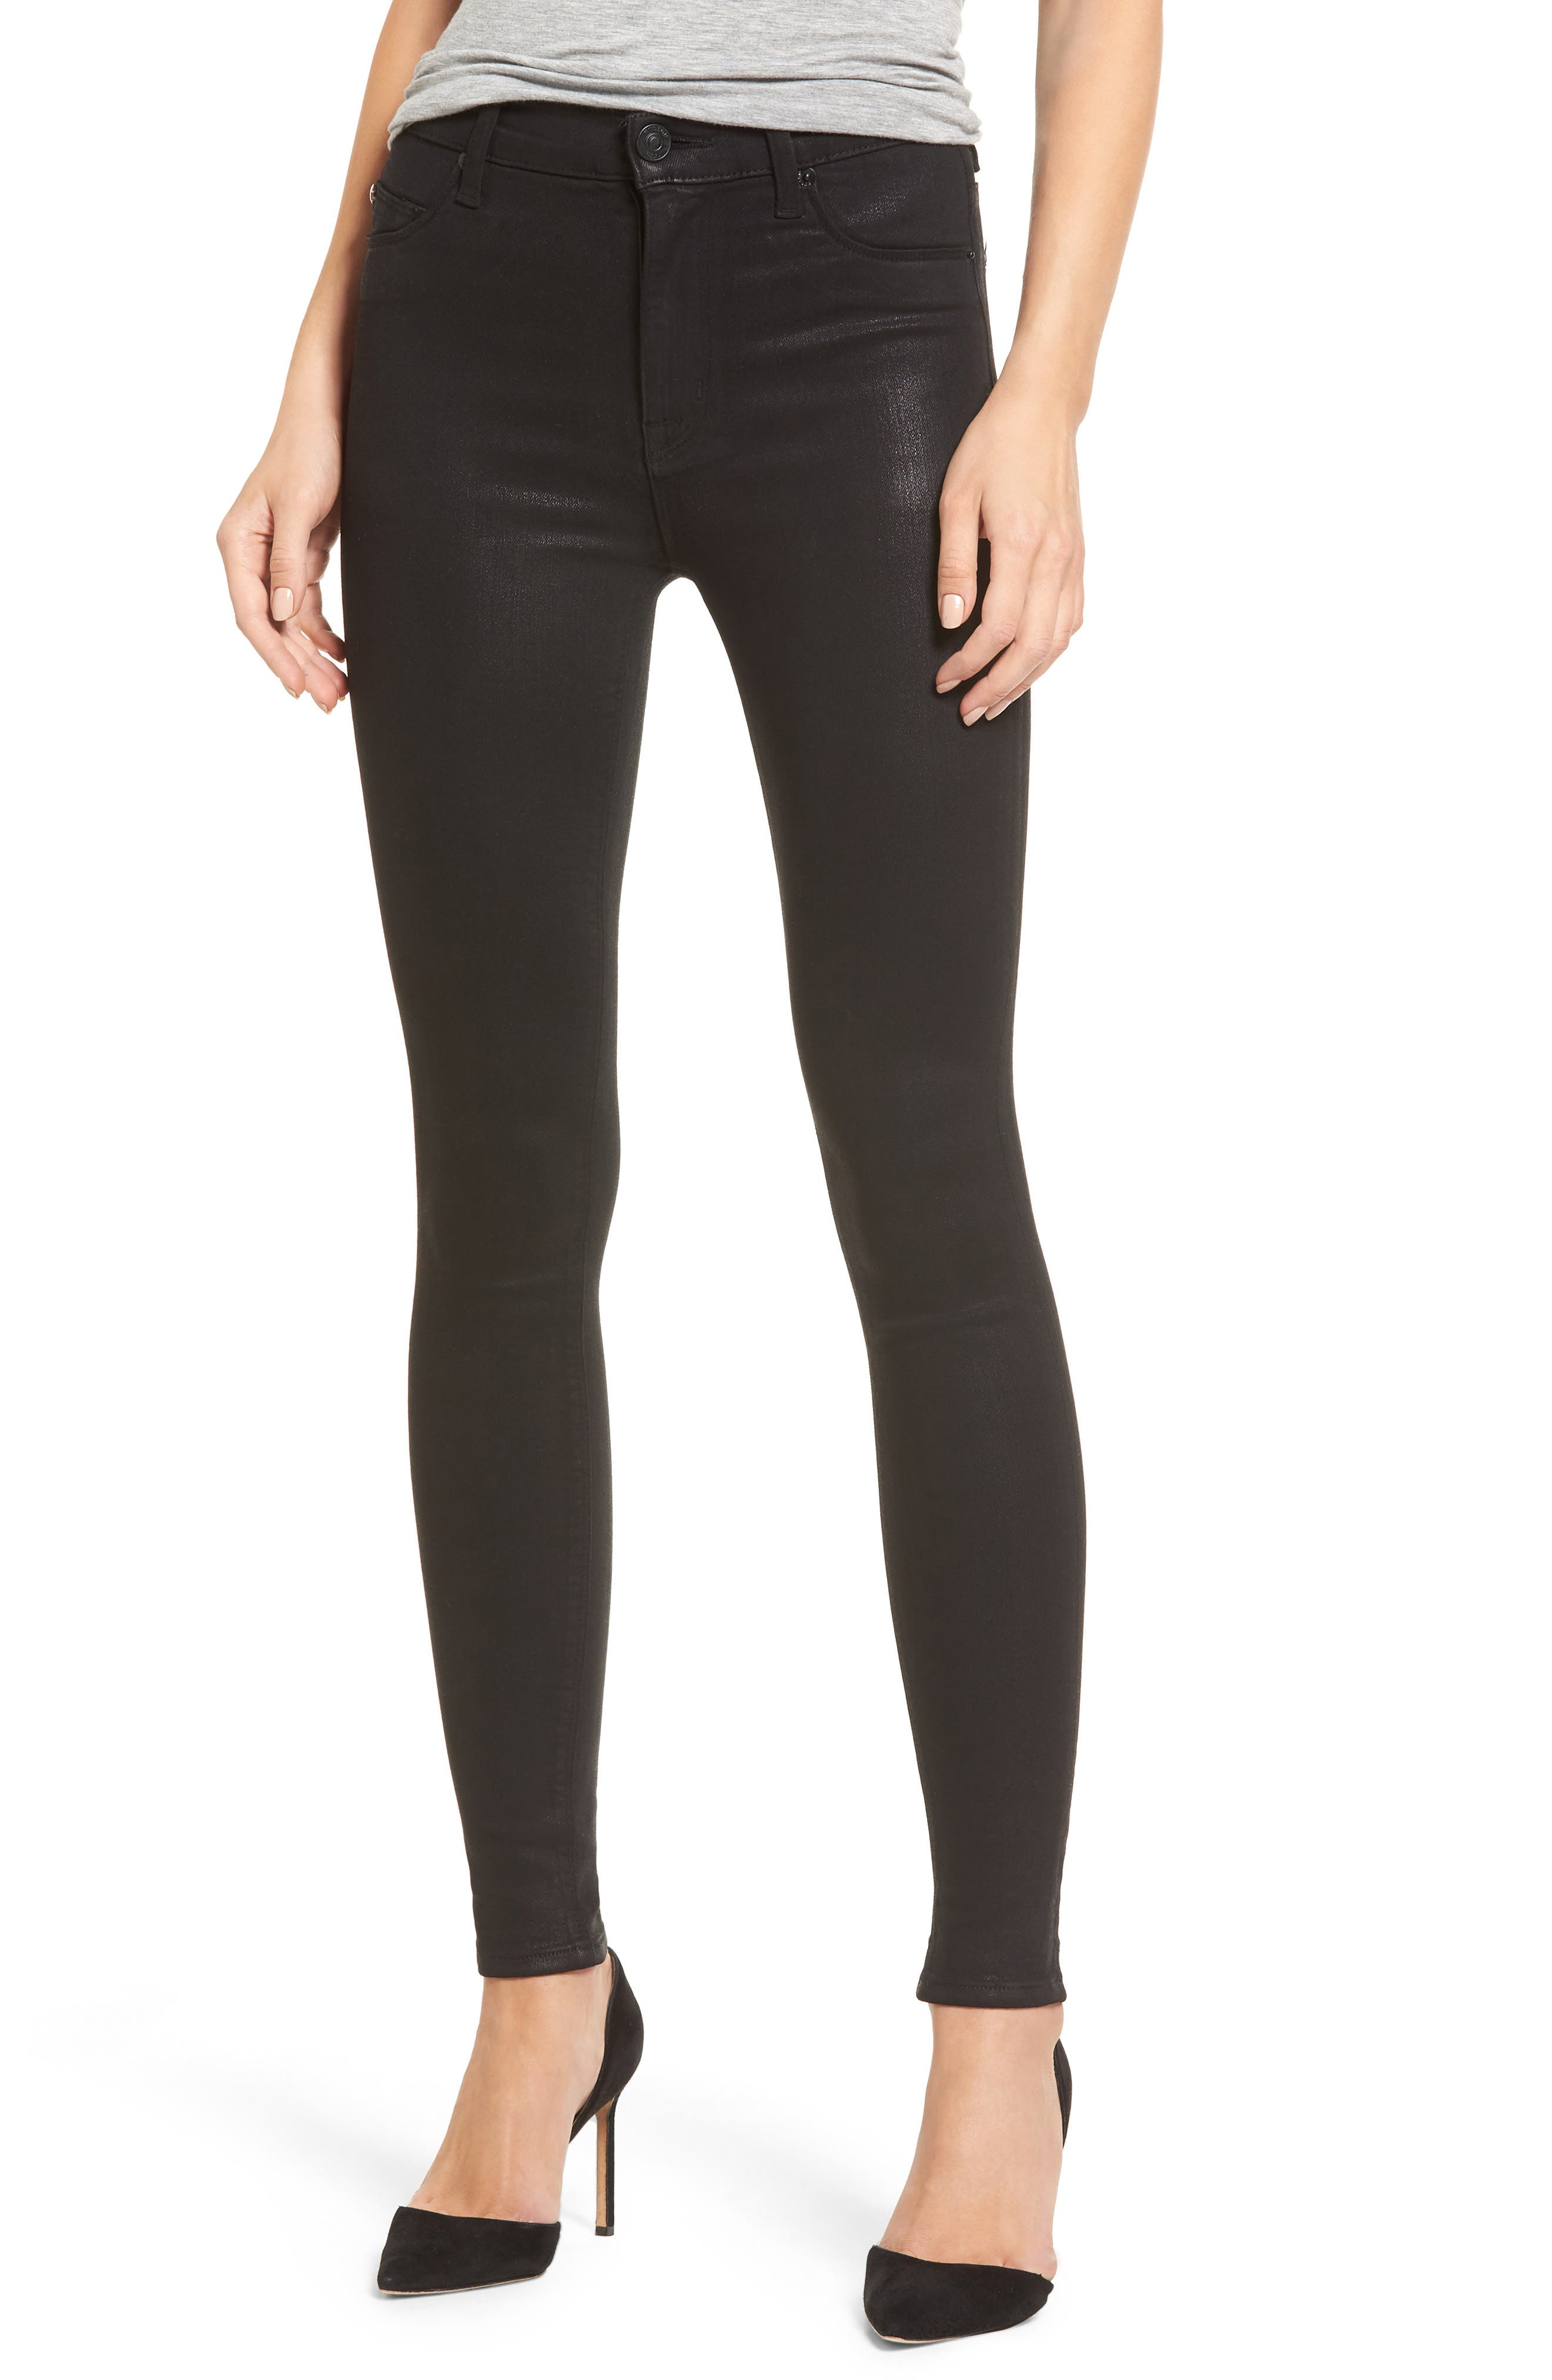 Main Image - Hudson Jeans Barbara High Waist Skinny Jeans (Noir Coated)